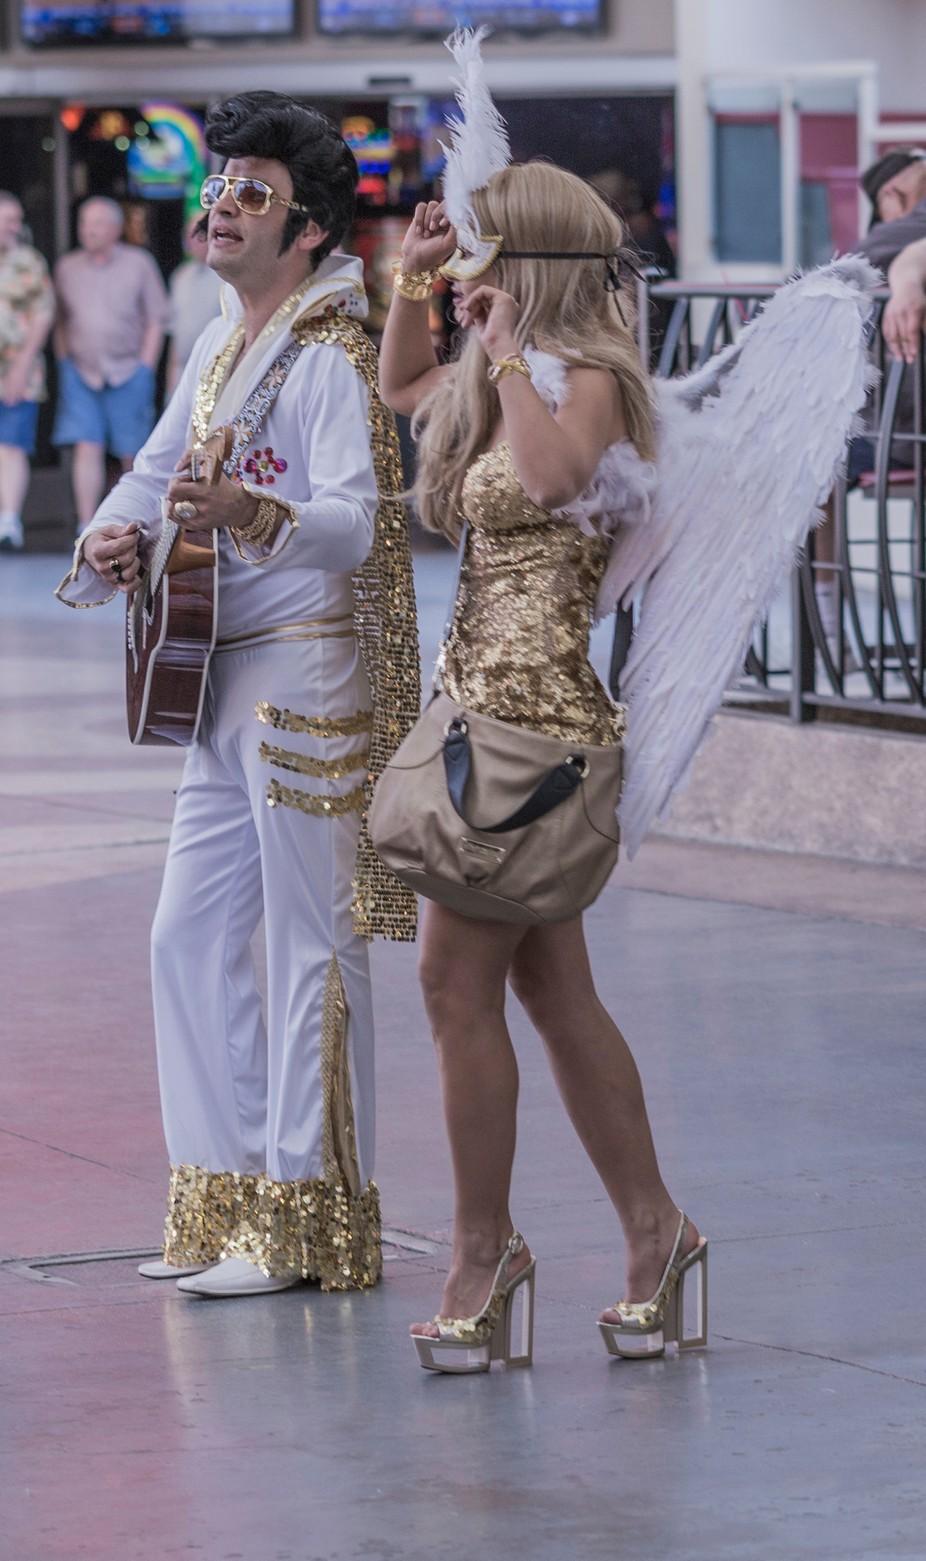 Crazy Vegas Peeps 6 - Elvis and his one Angel